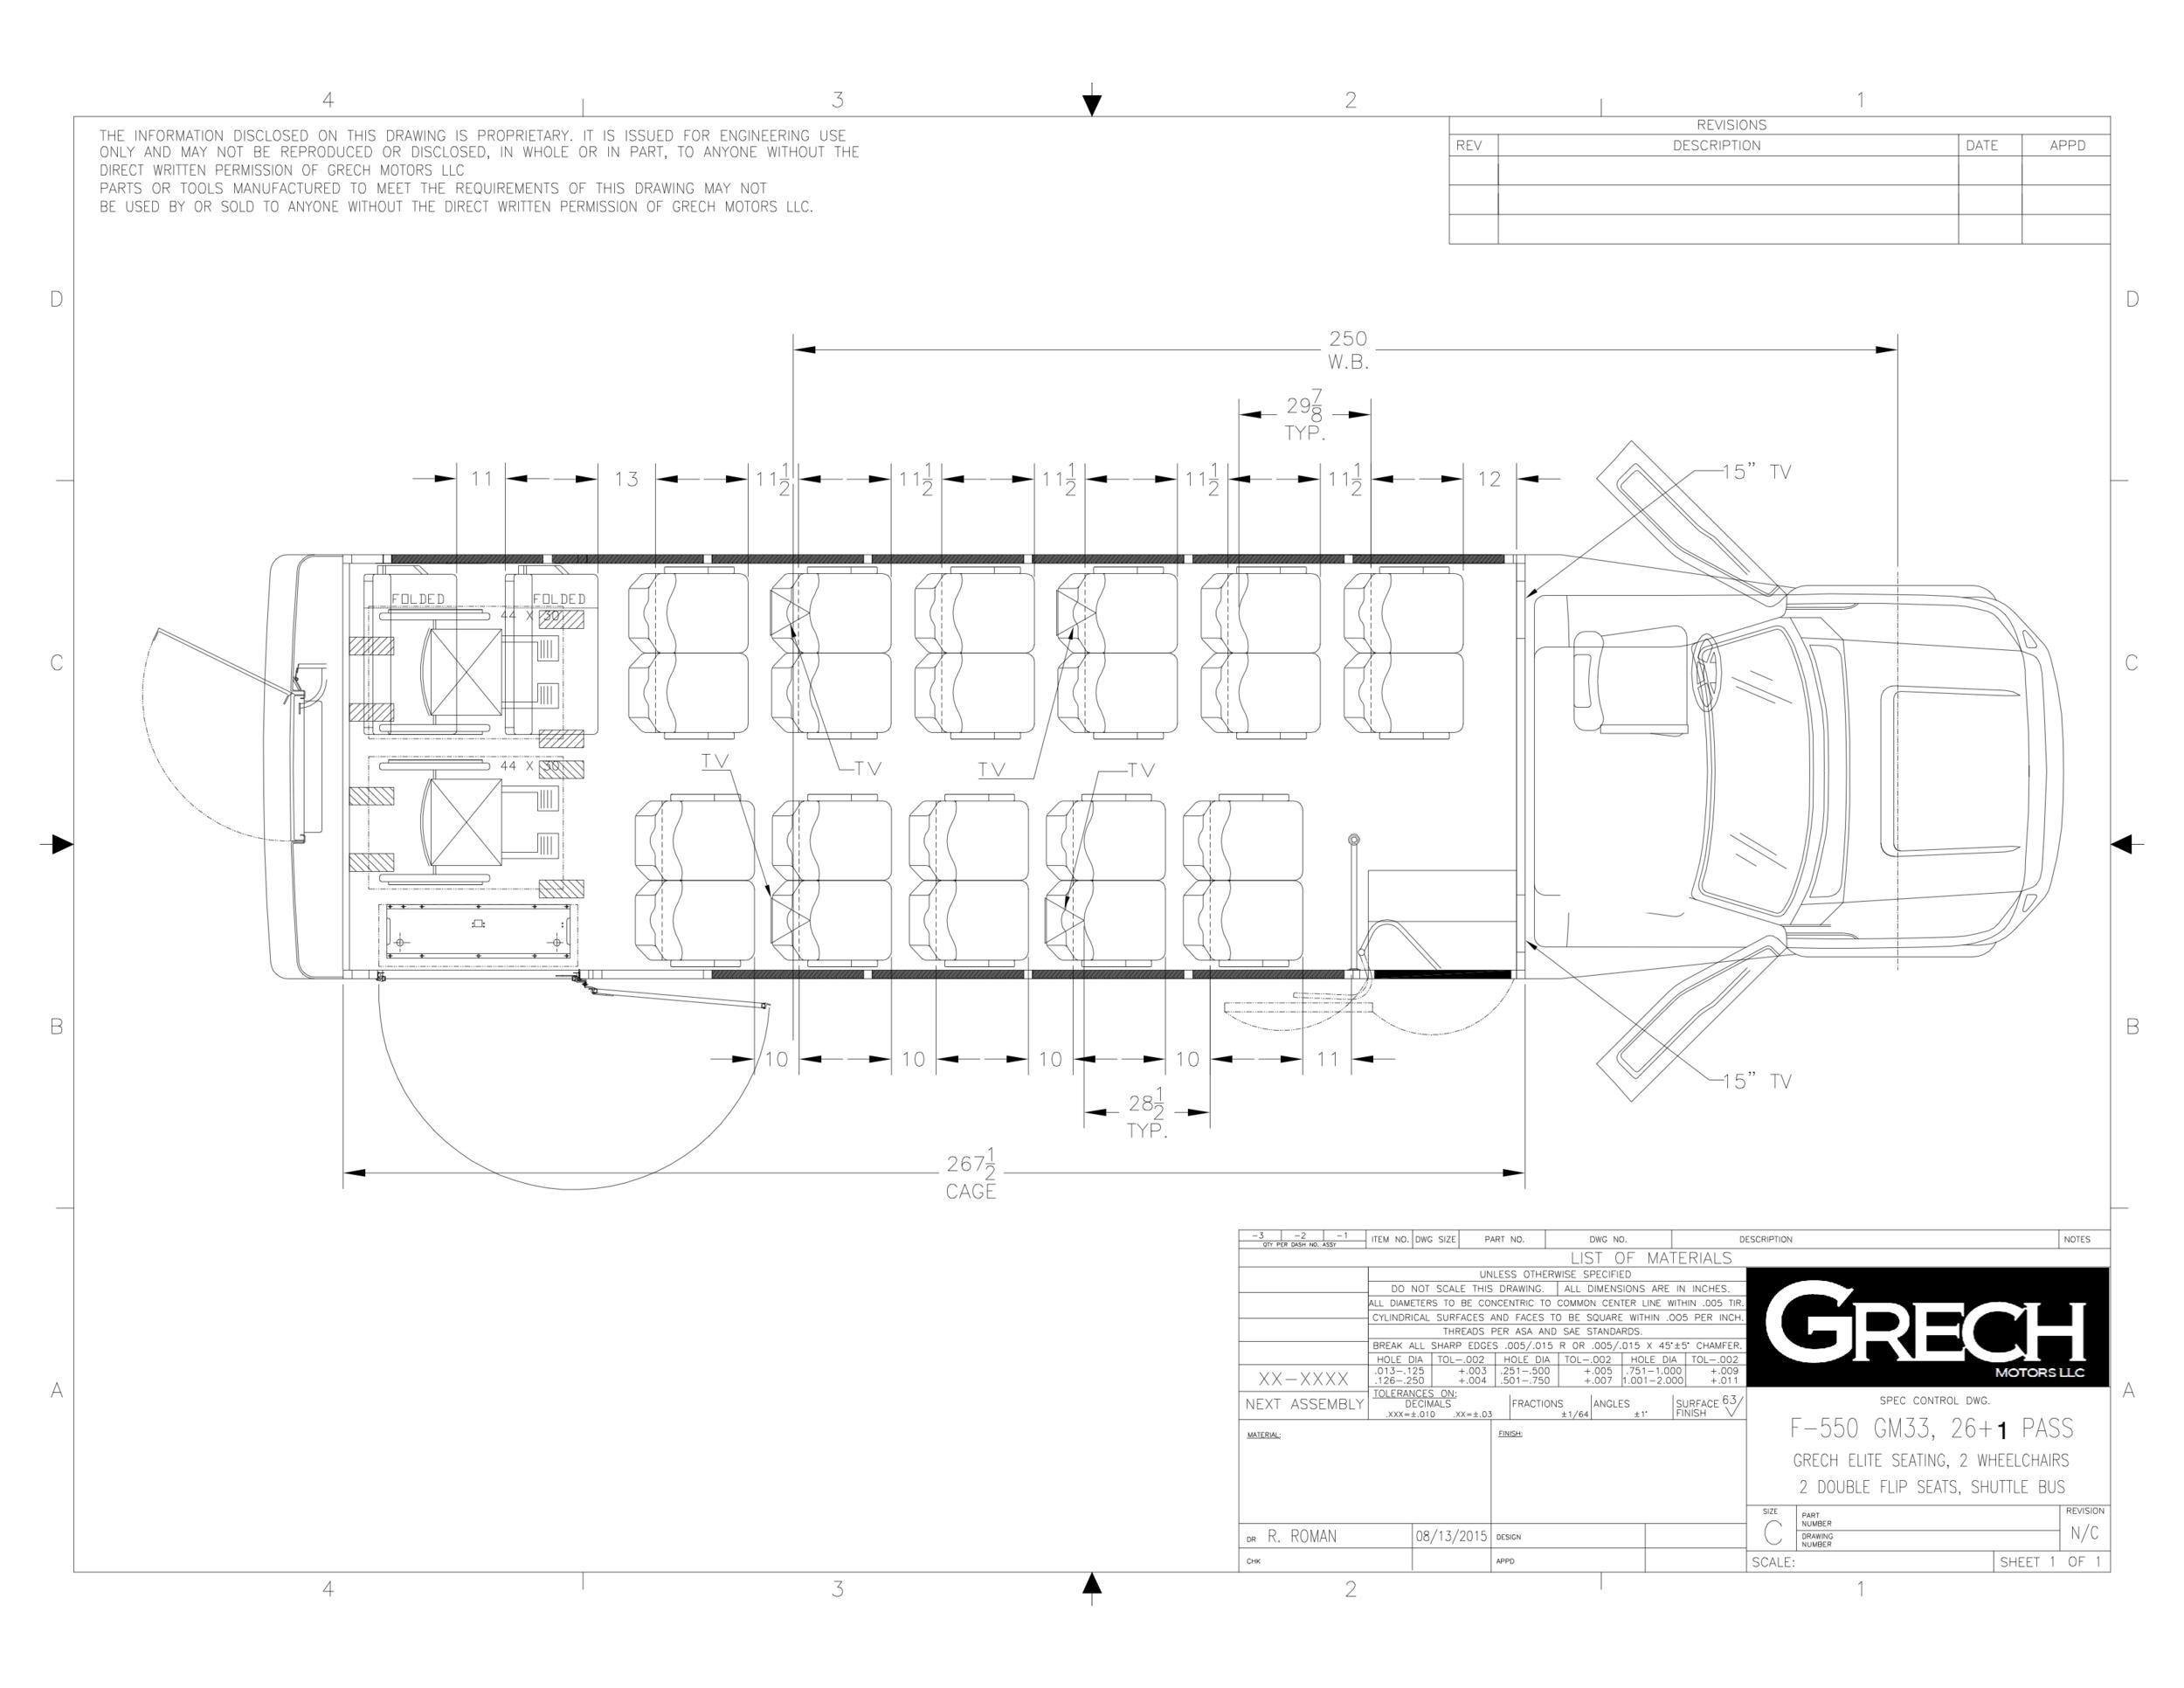 F-550 GM33 26+1, Grech Seating Seats, 2 Wheelchair, 2 DB Flip Seats, No Lug., Shuttle copy 2